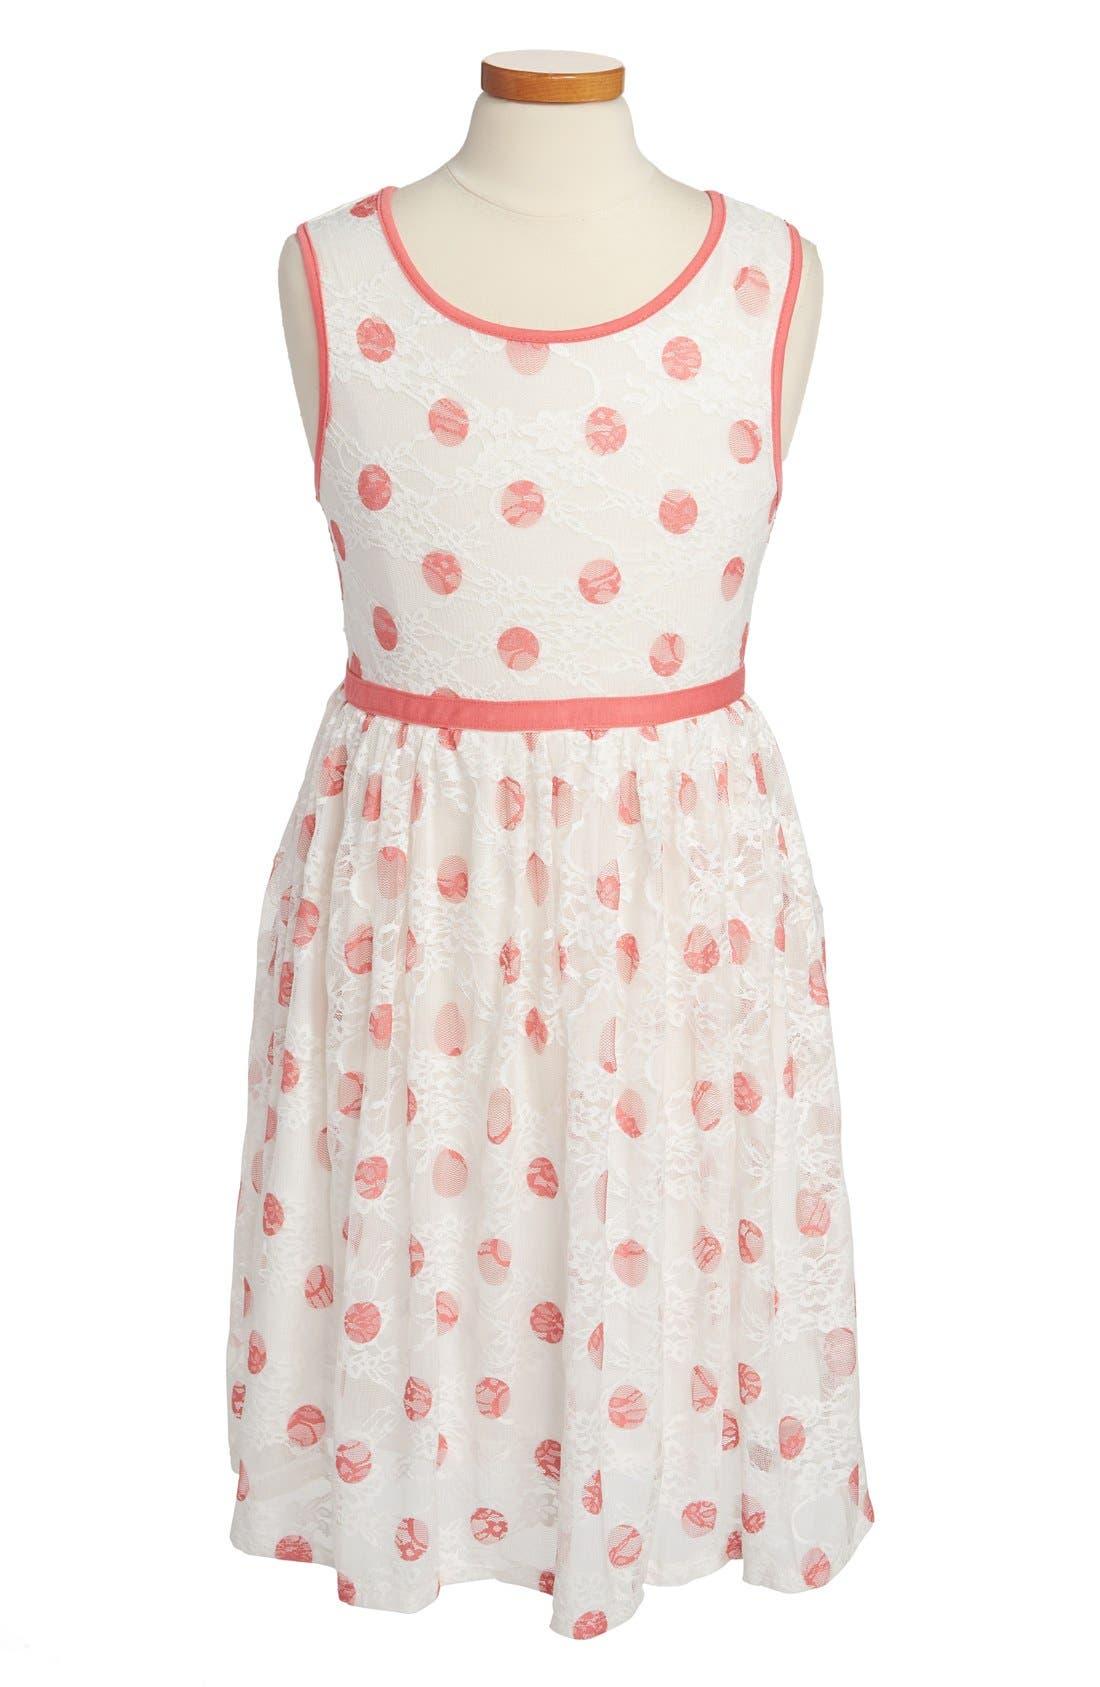 Dot Print Lace Dress,                         Main,                         color, Ivory/ Coral